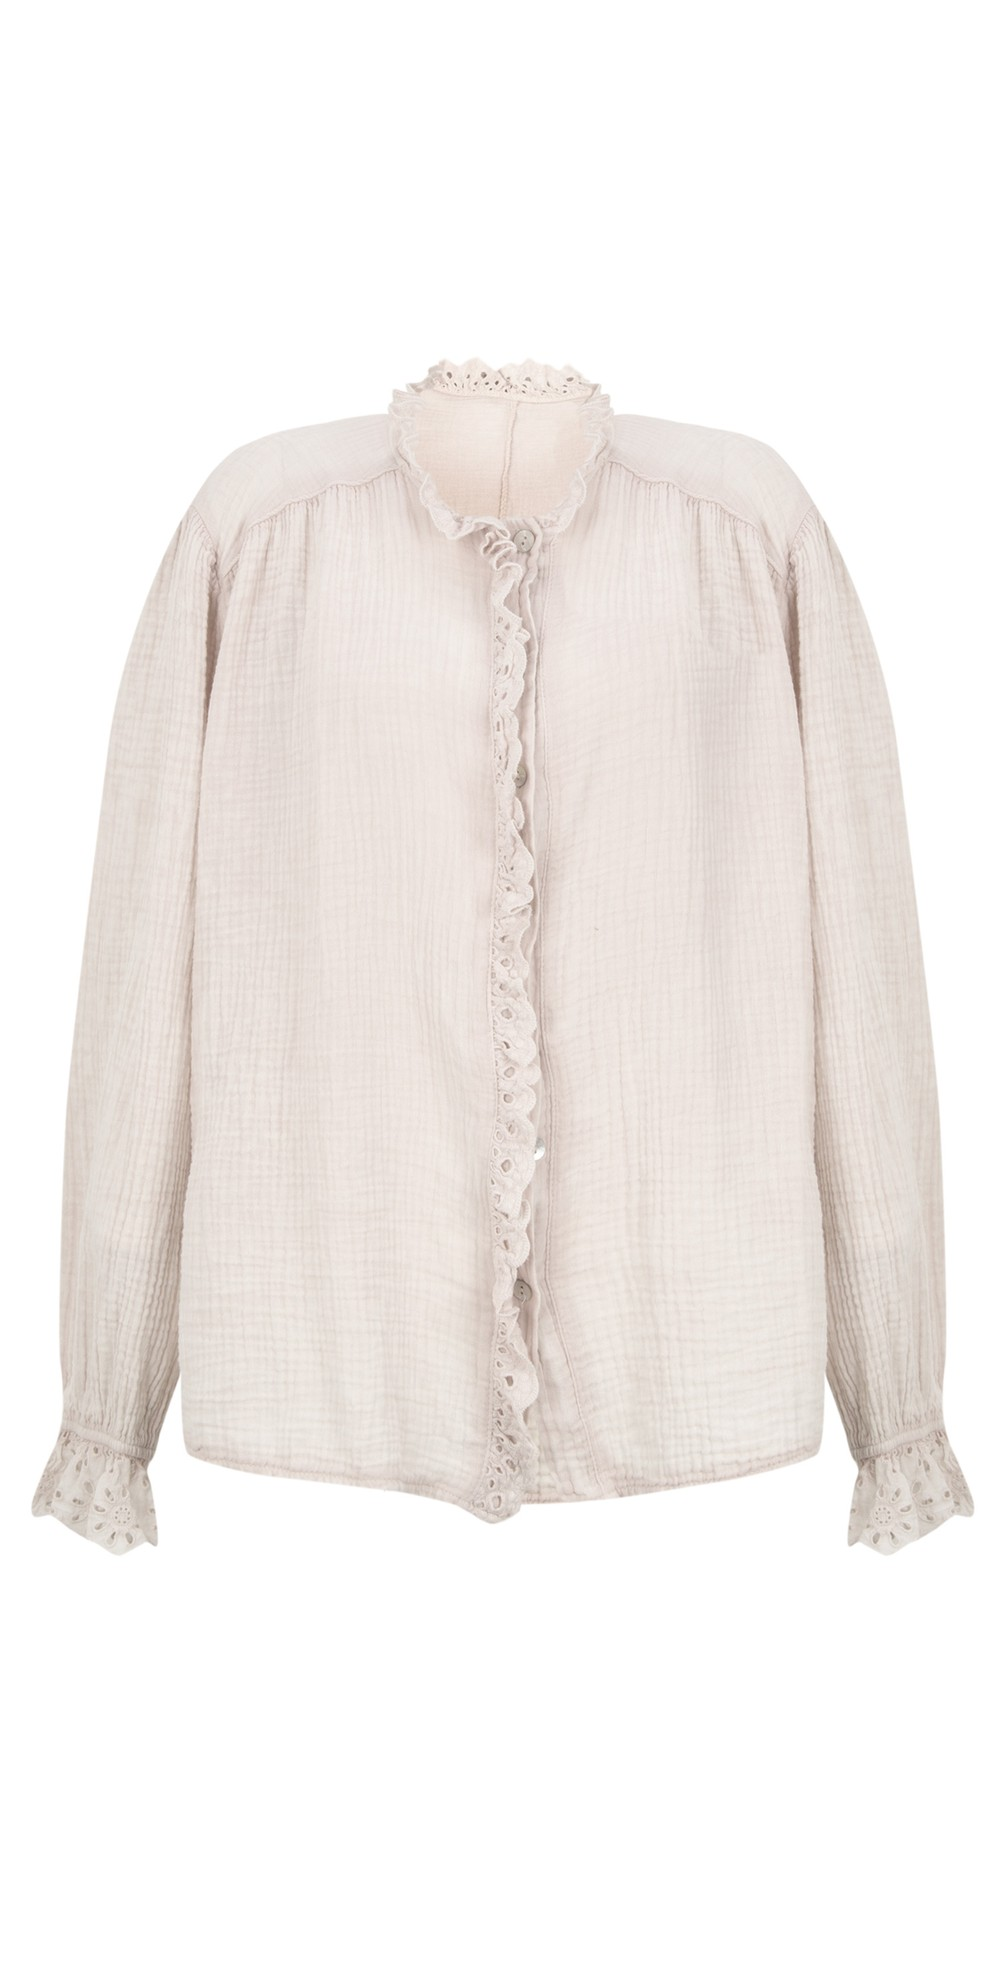 Sienna Broderie Anglaise Trim Shirt main image